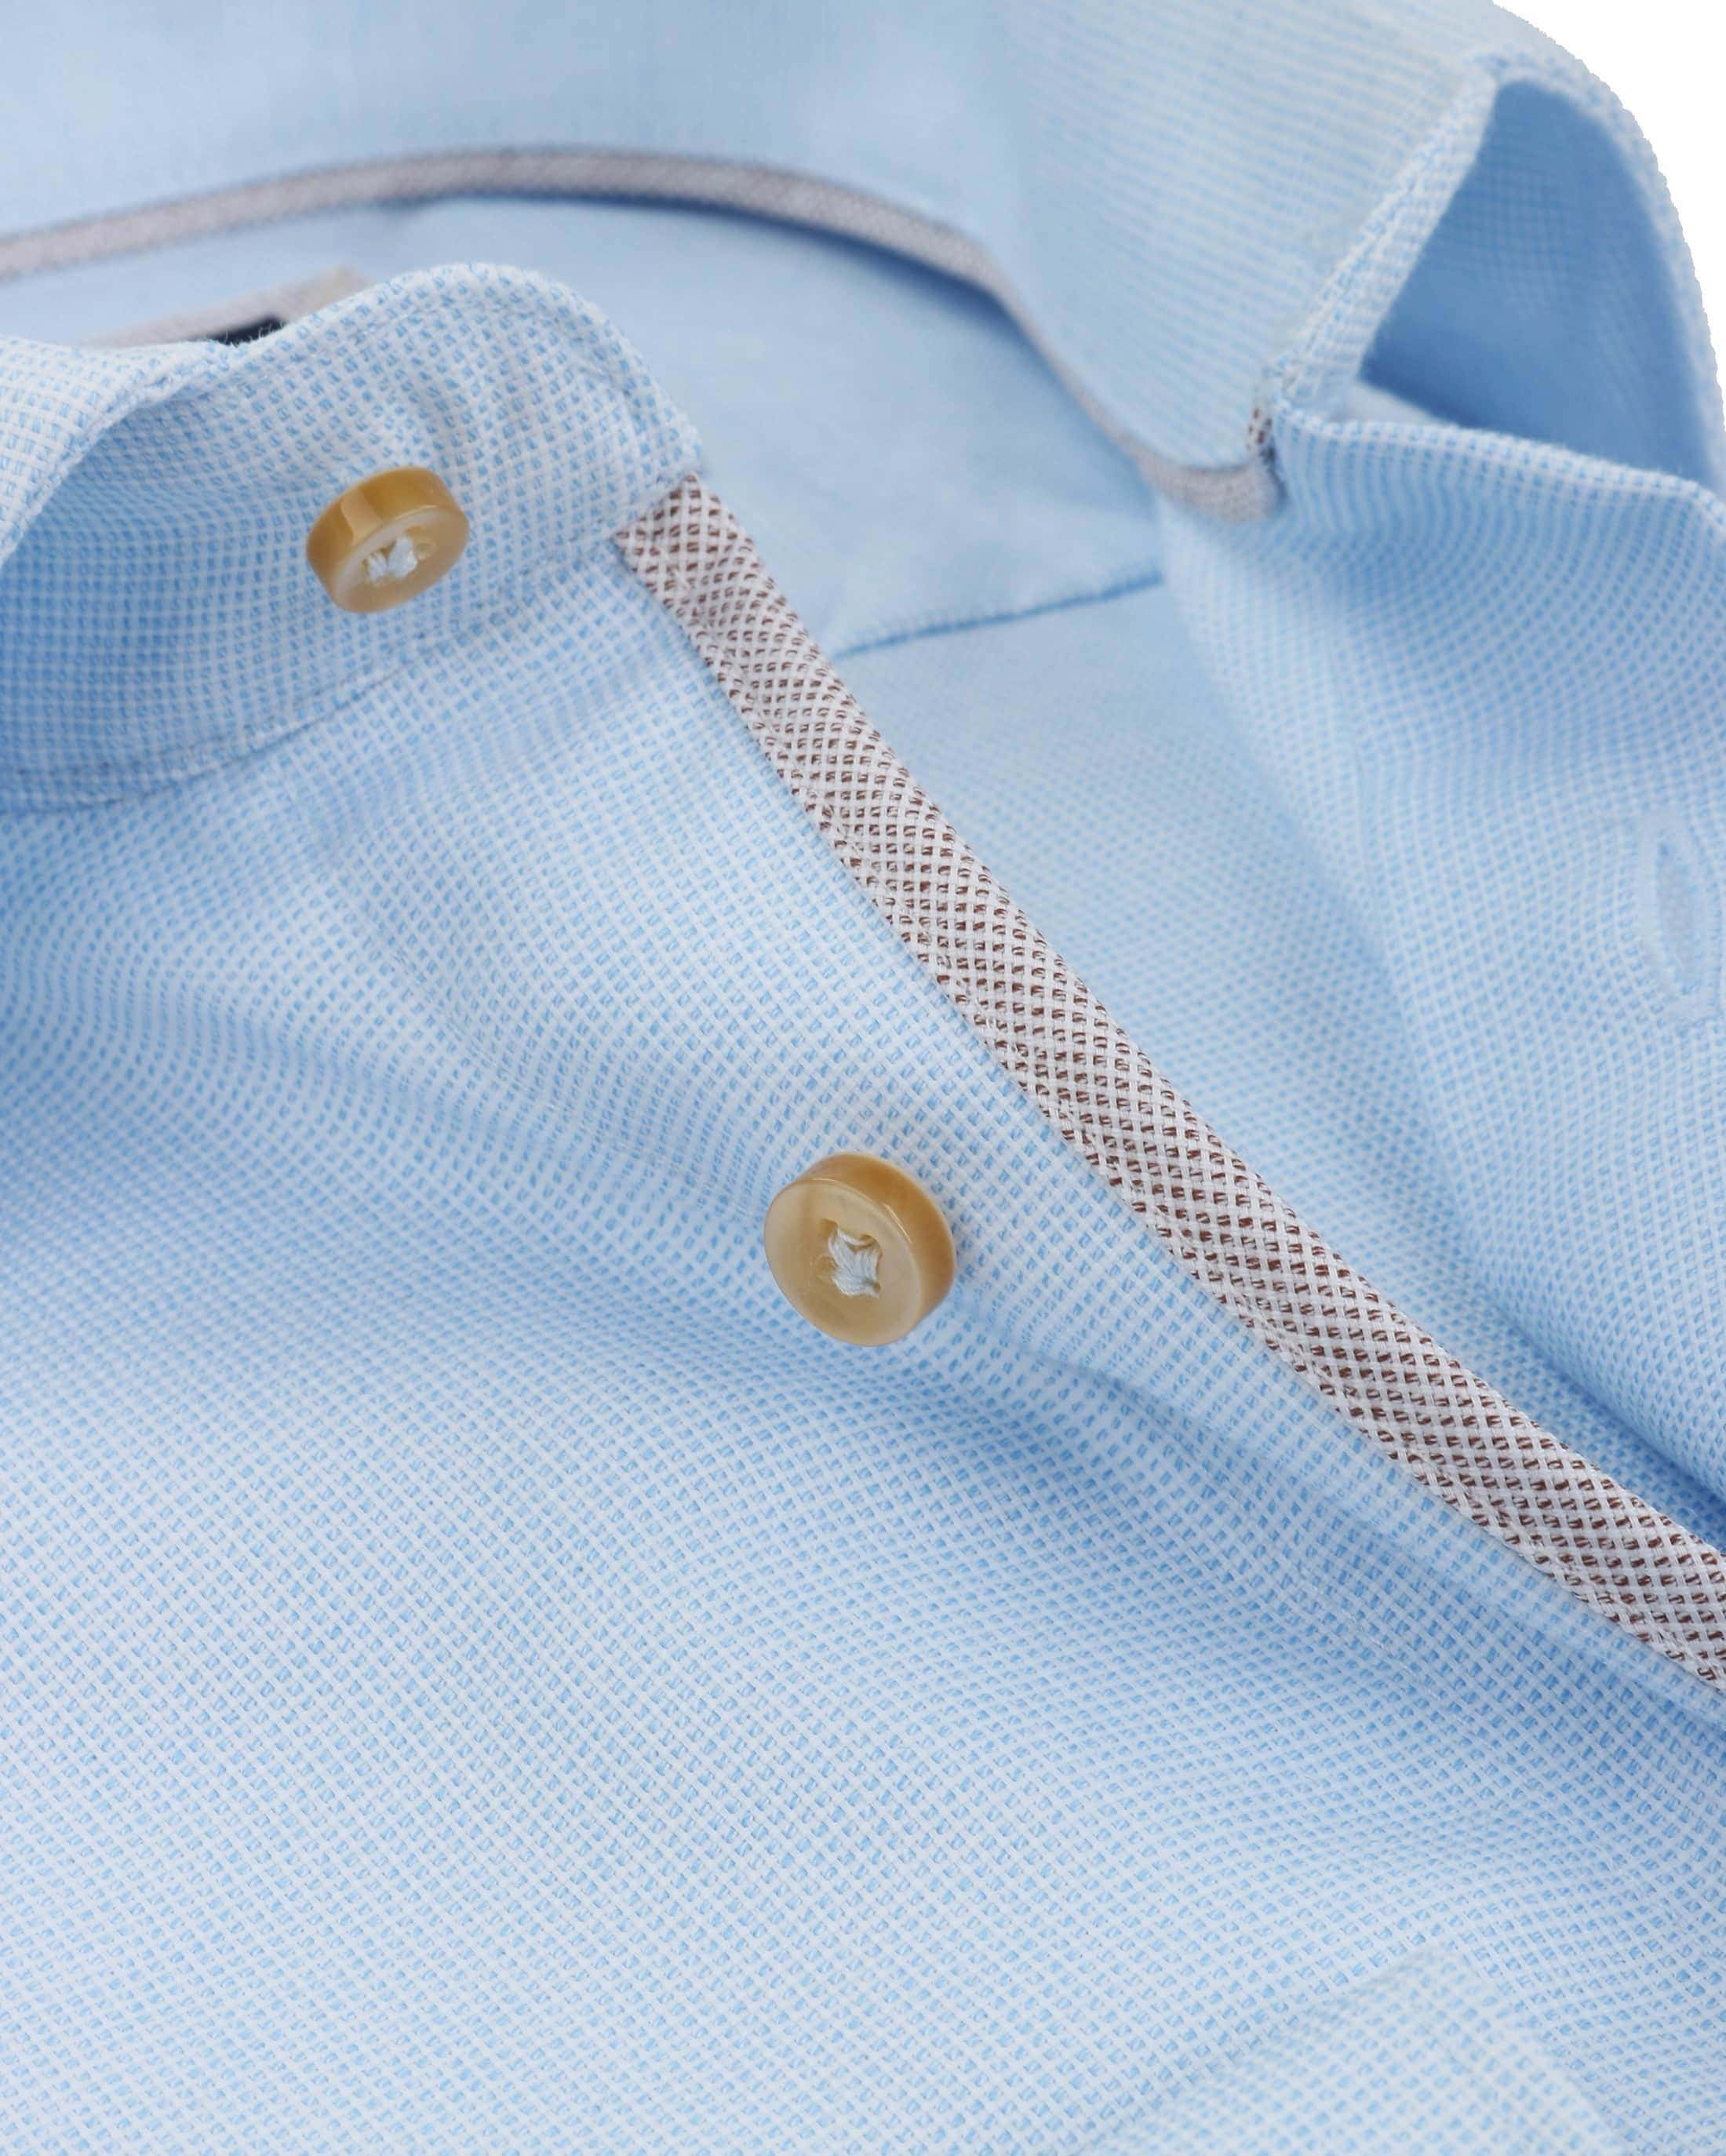 Profuomo Overhemd SF Blauw Ruit foto 1